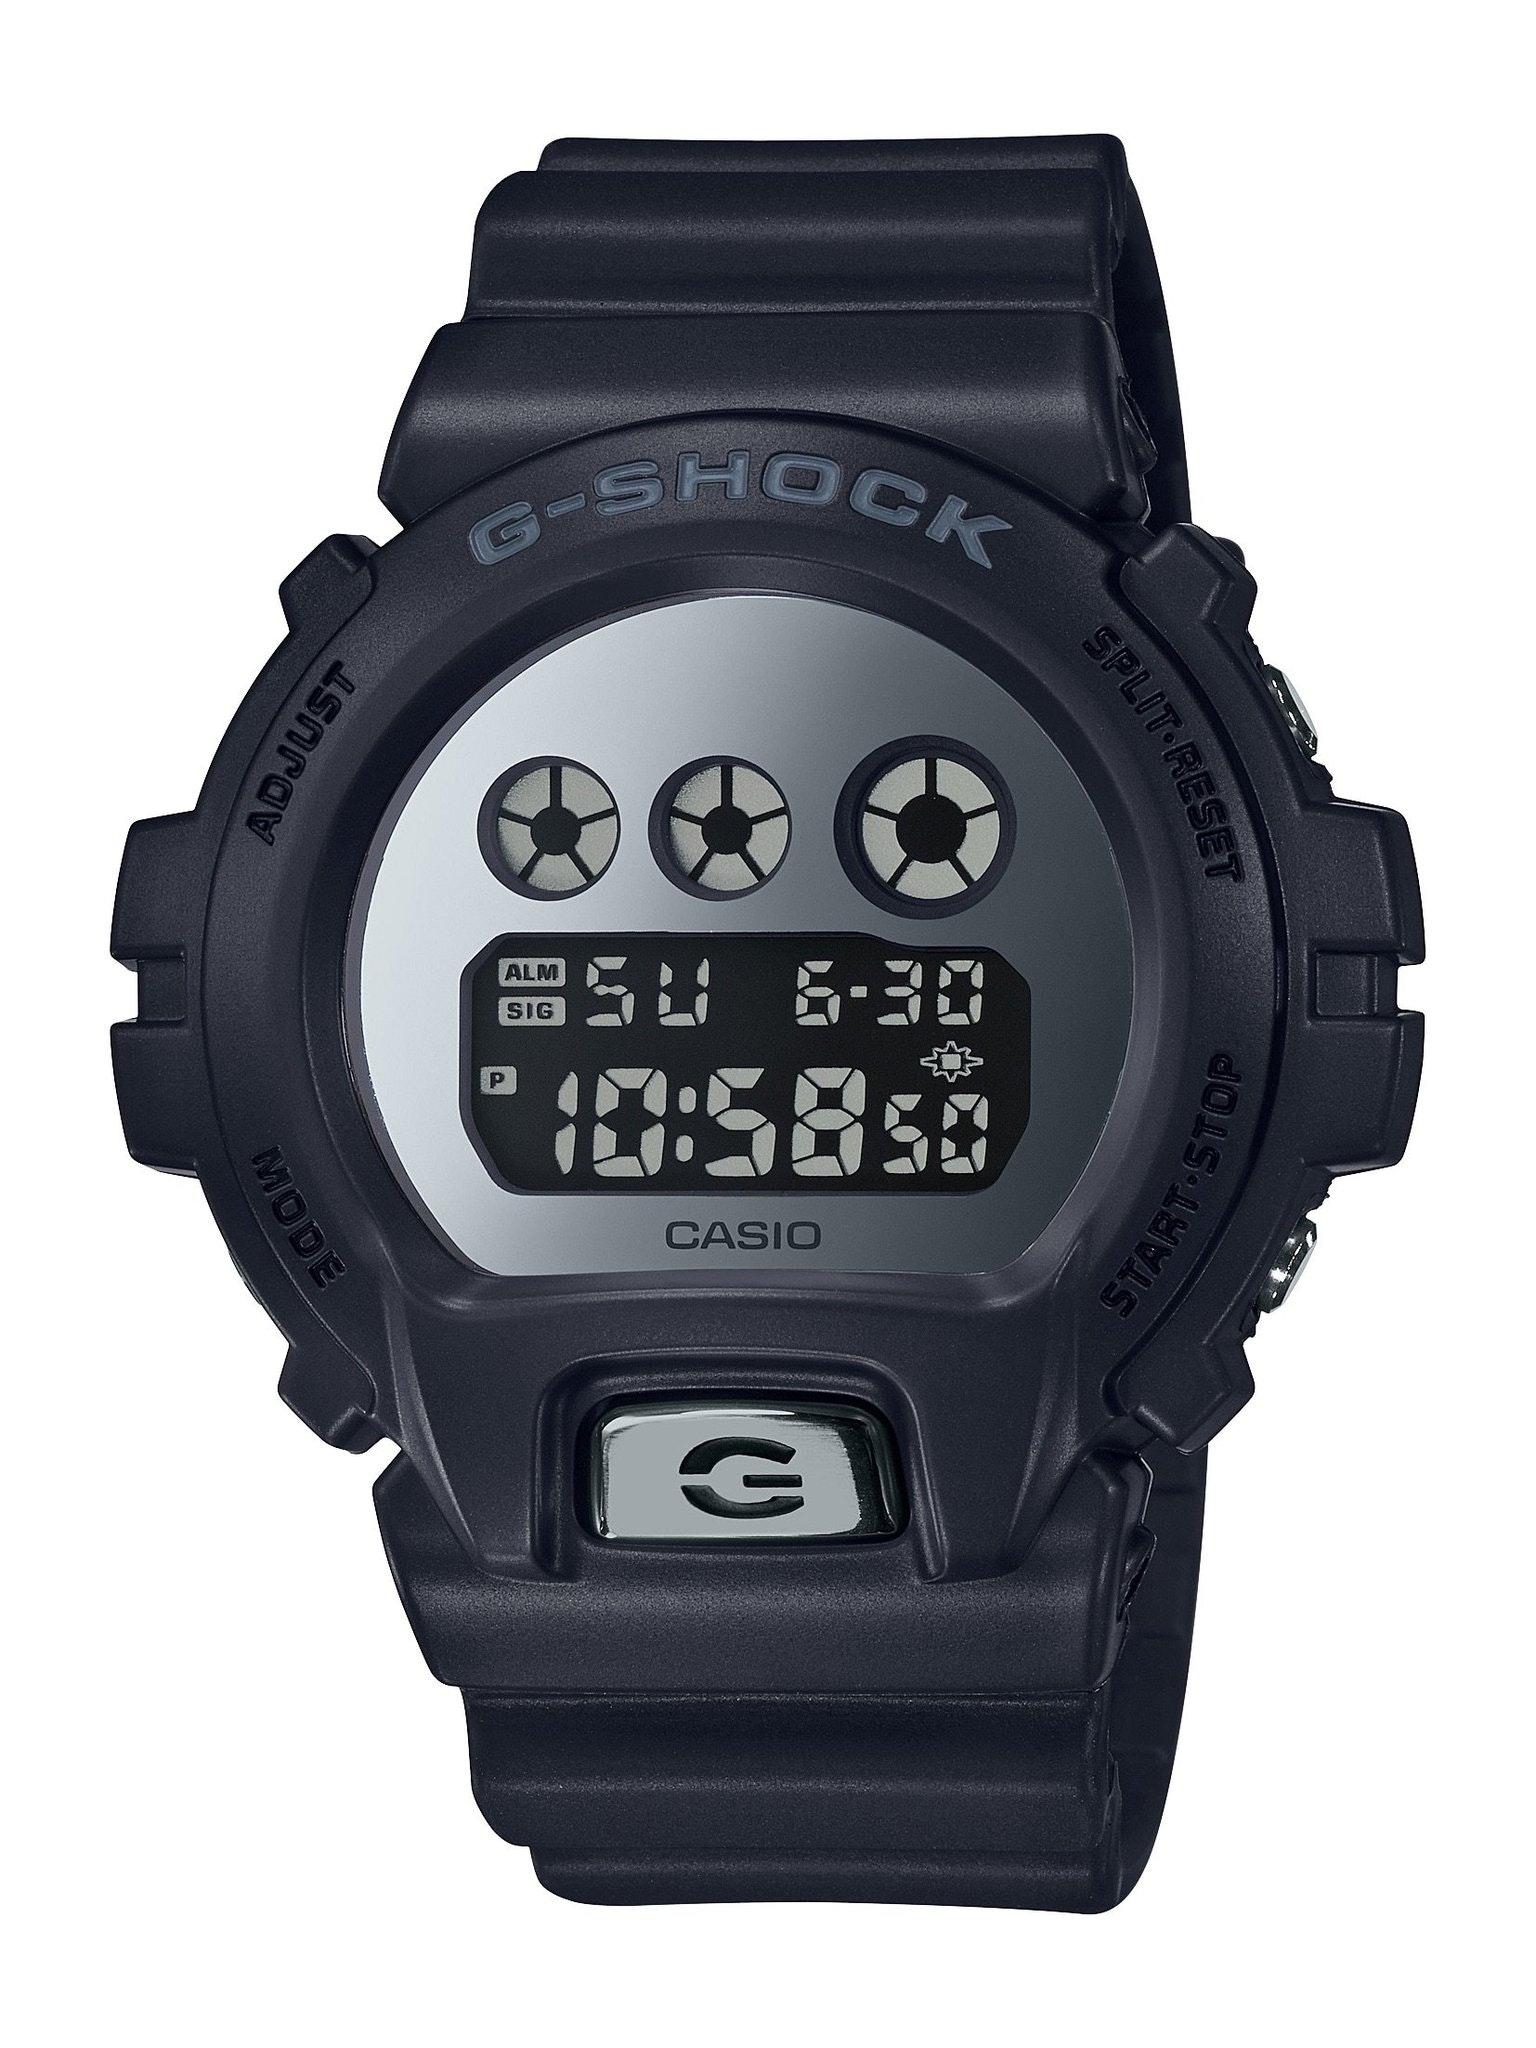 Casio G-Shock DW6900MMA-1